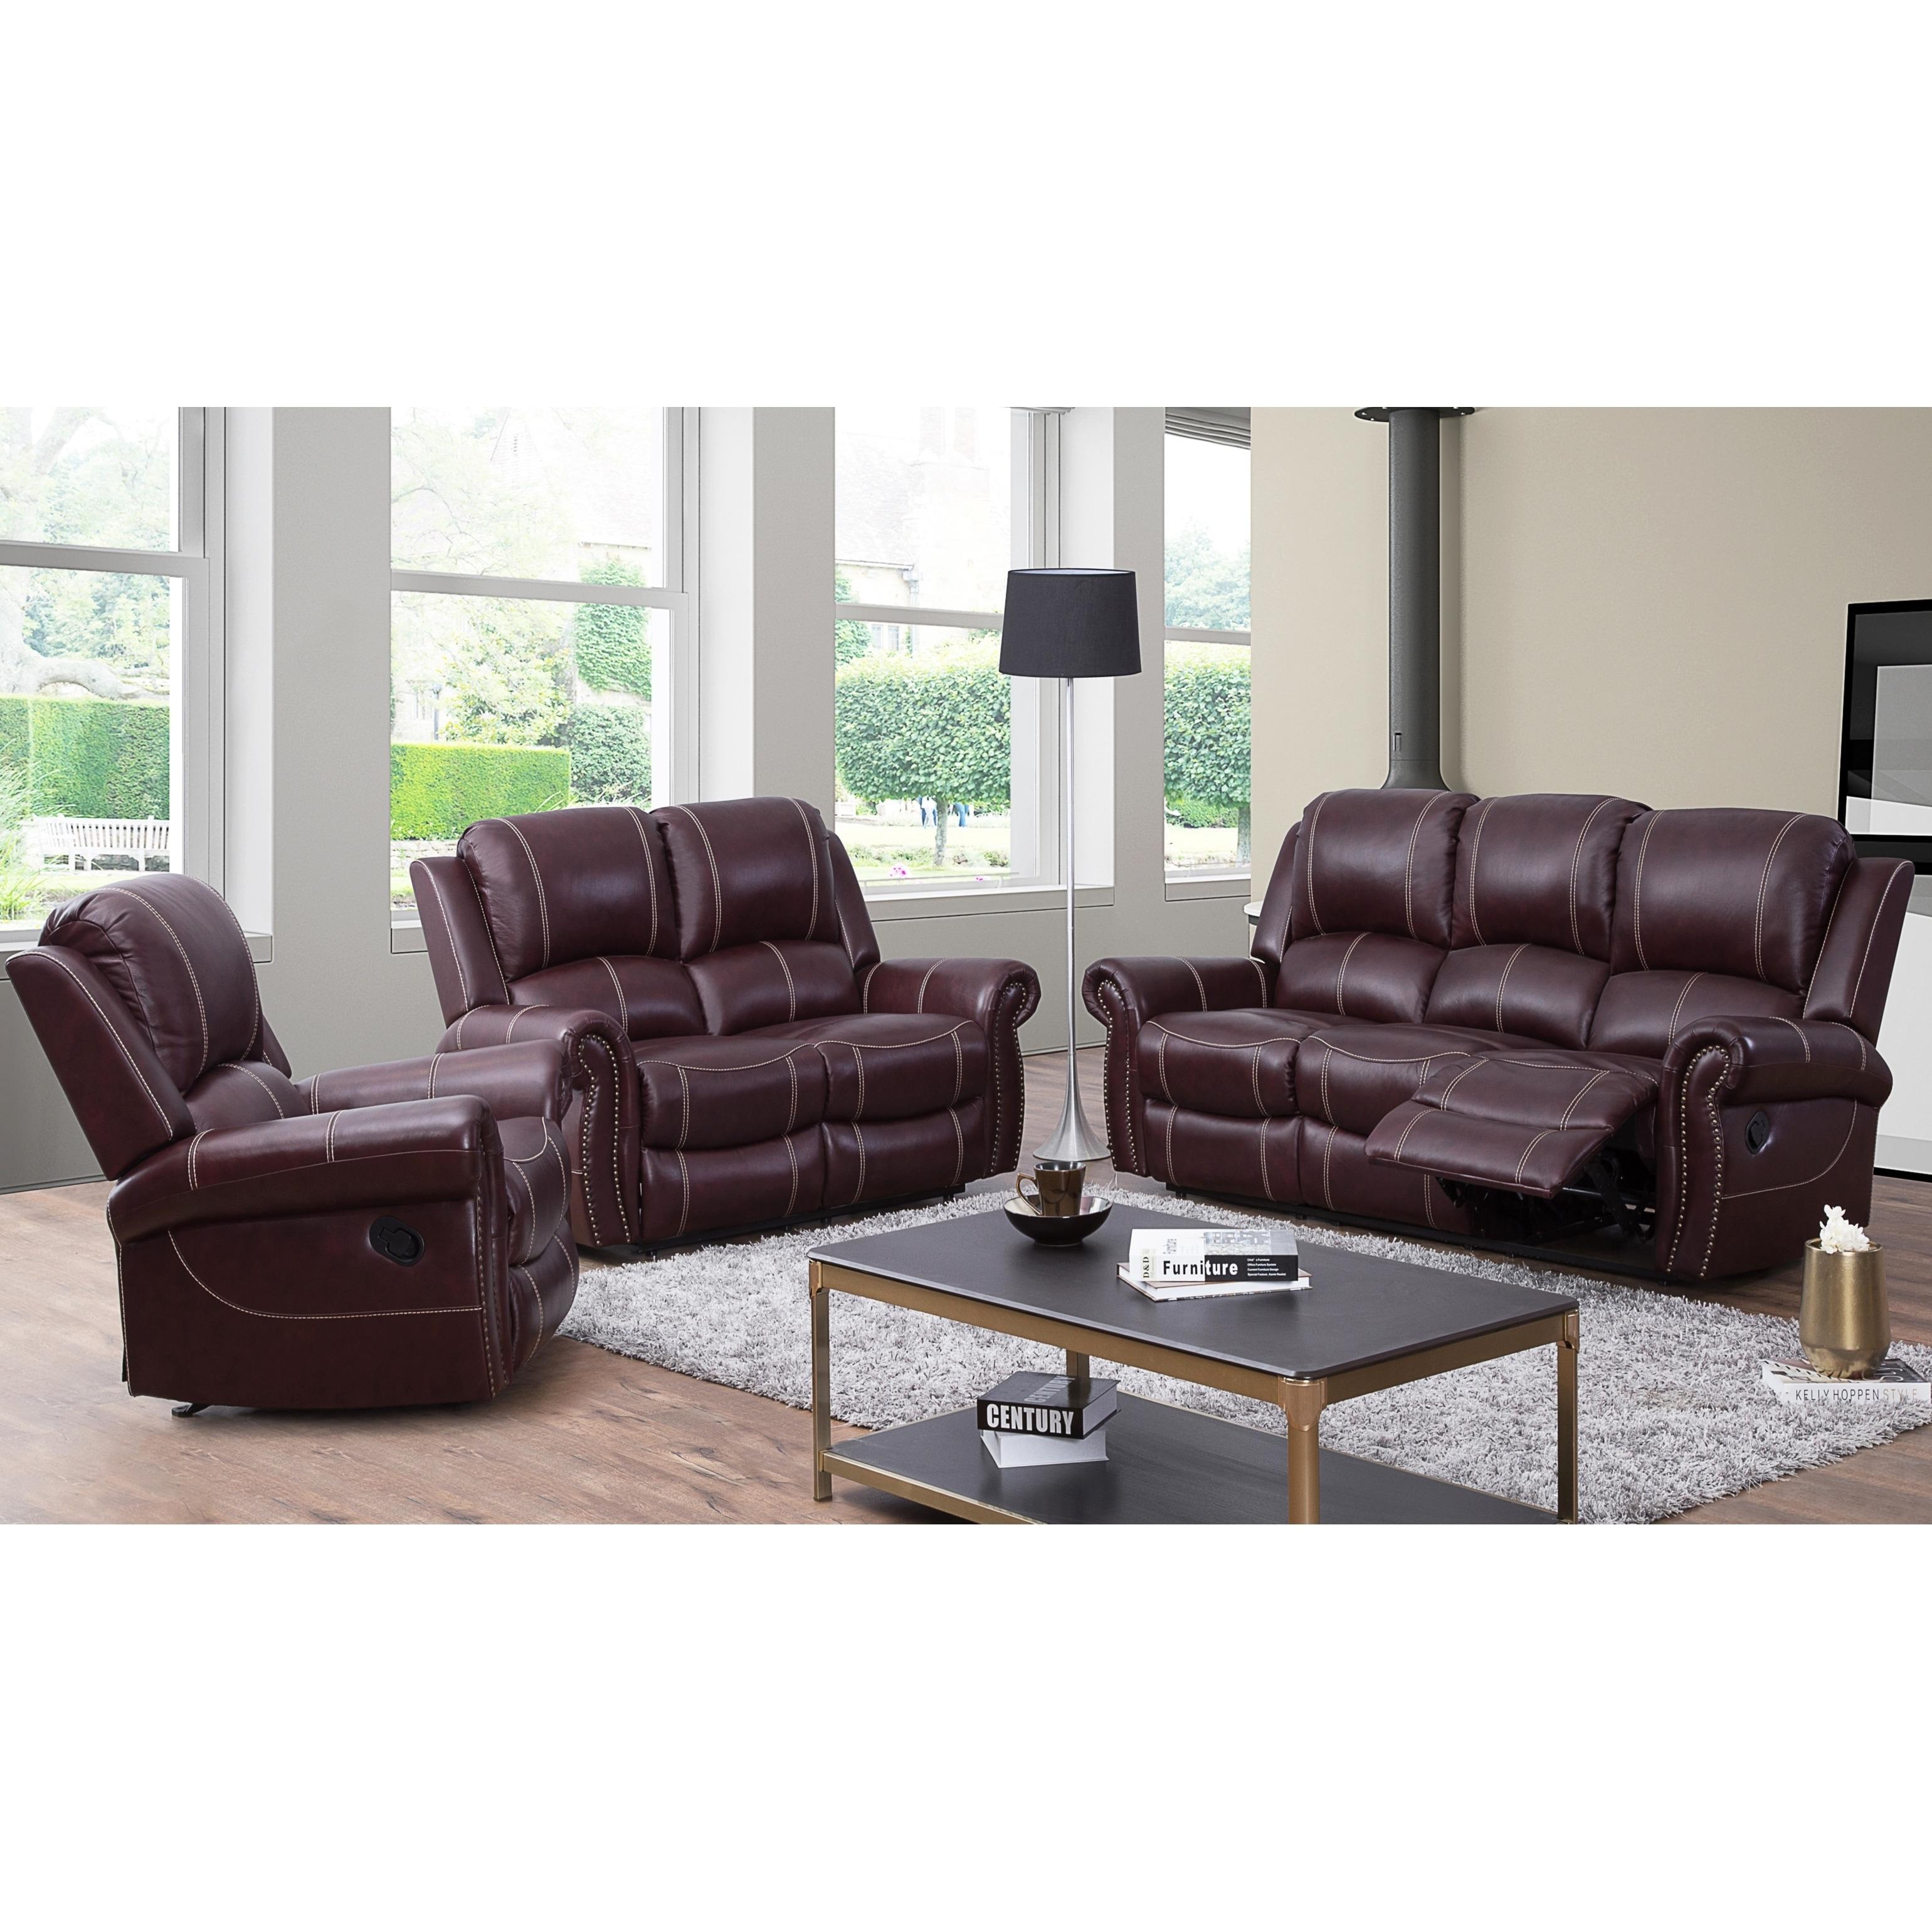 Abbyson Winston Burgundy Top Grain Leather Reclining 3 Piece Living Room Set